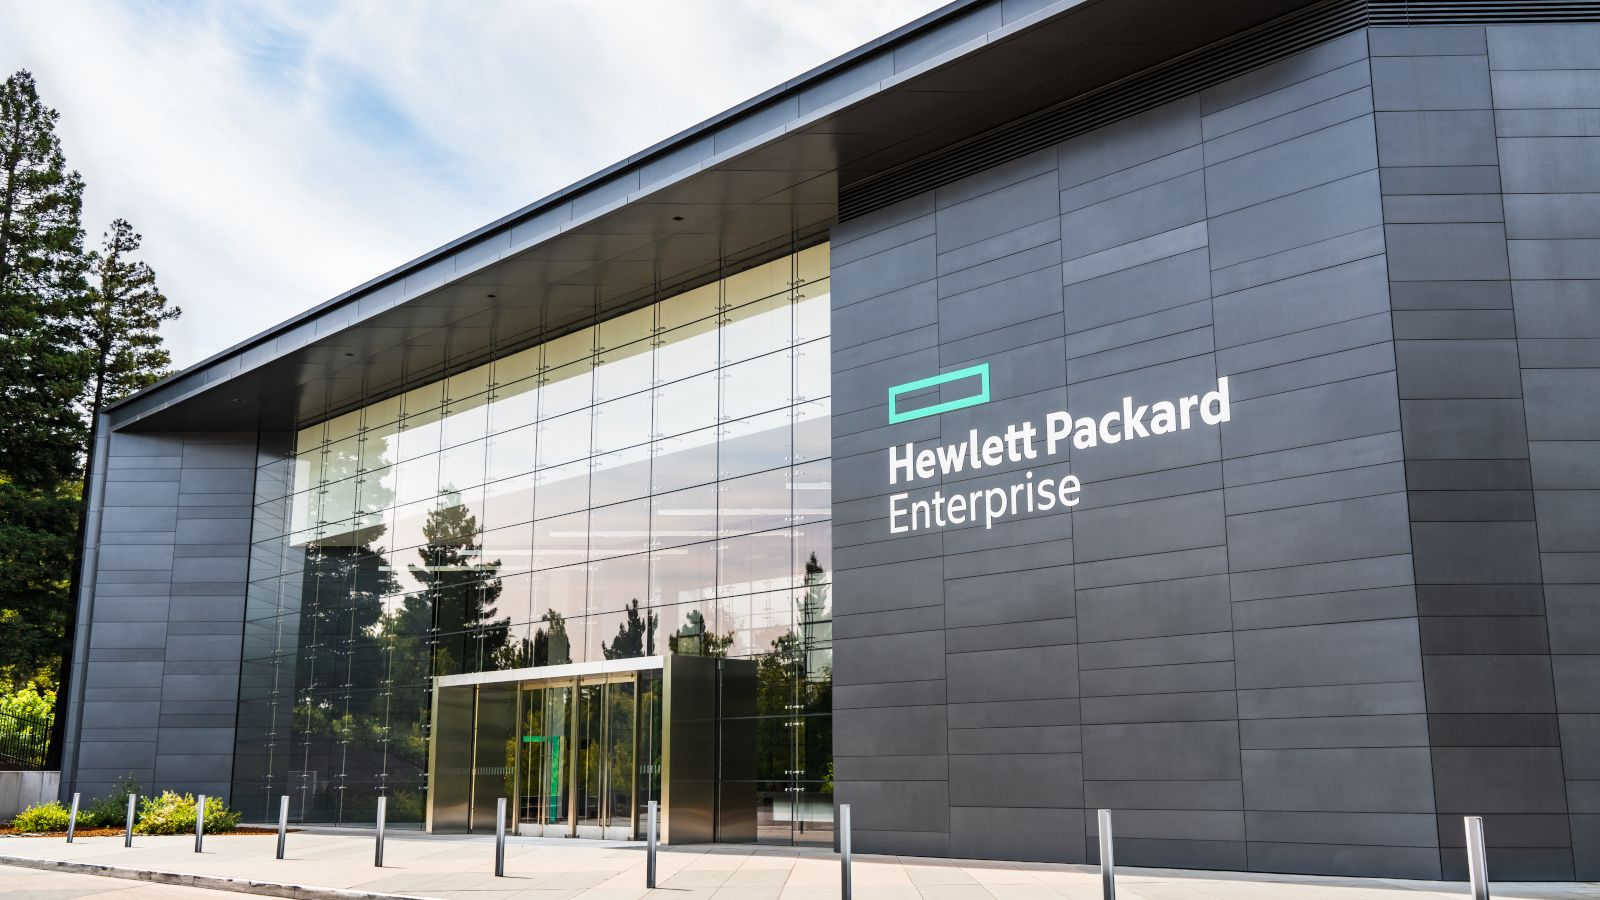 Hewlett Packard станет стратегическим партнером СК «Евразия»- Kapital.kz